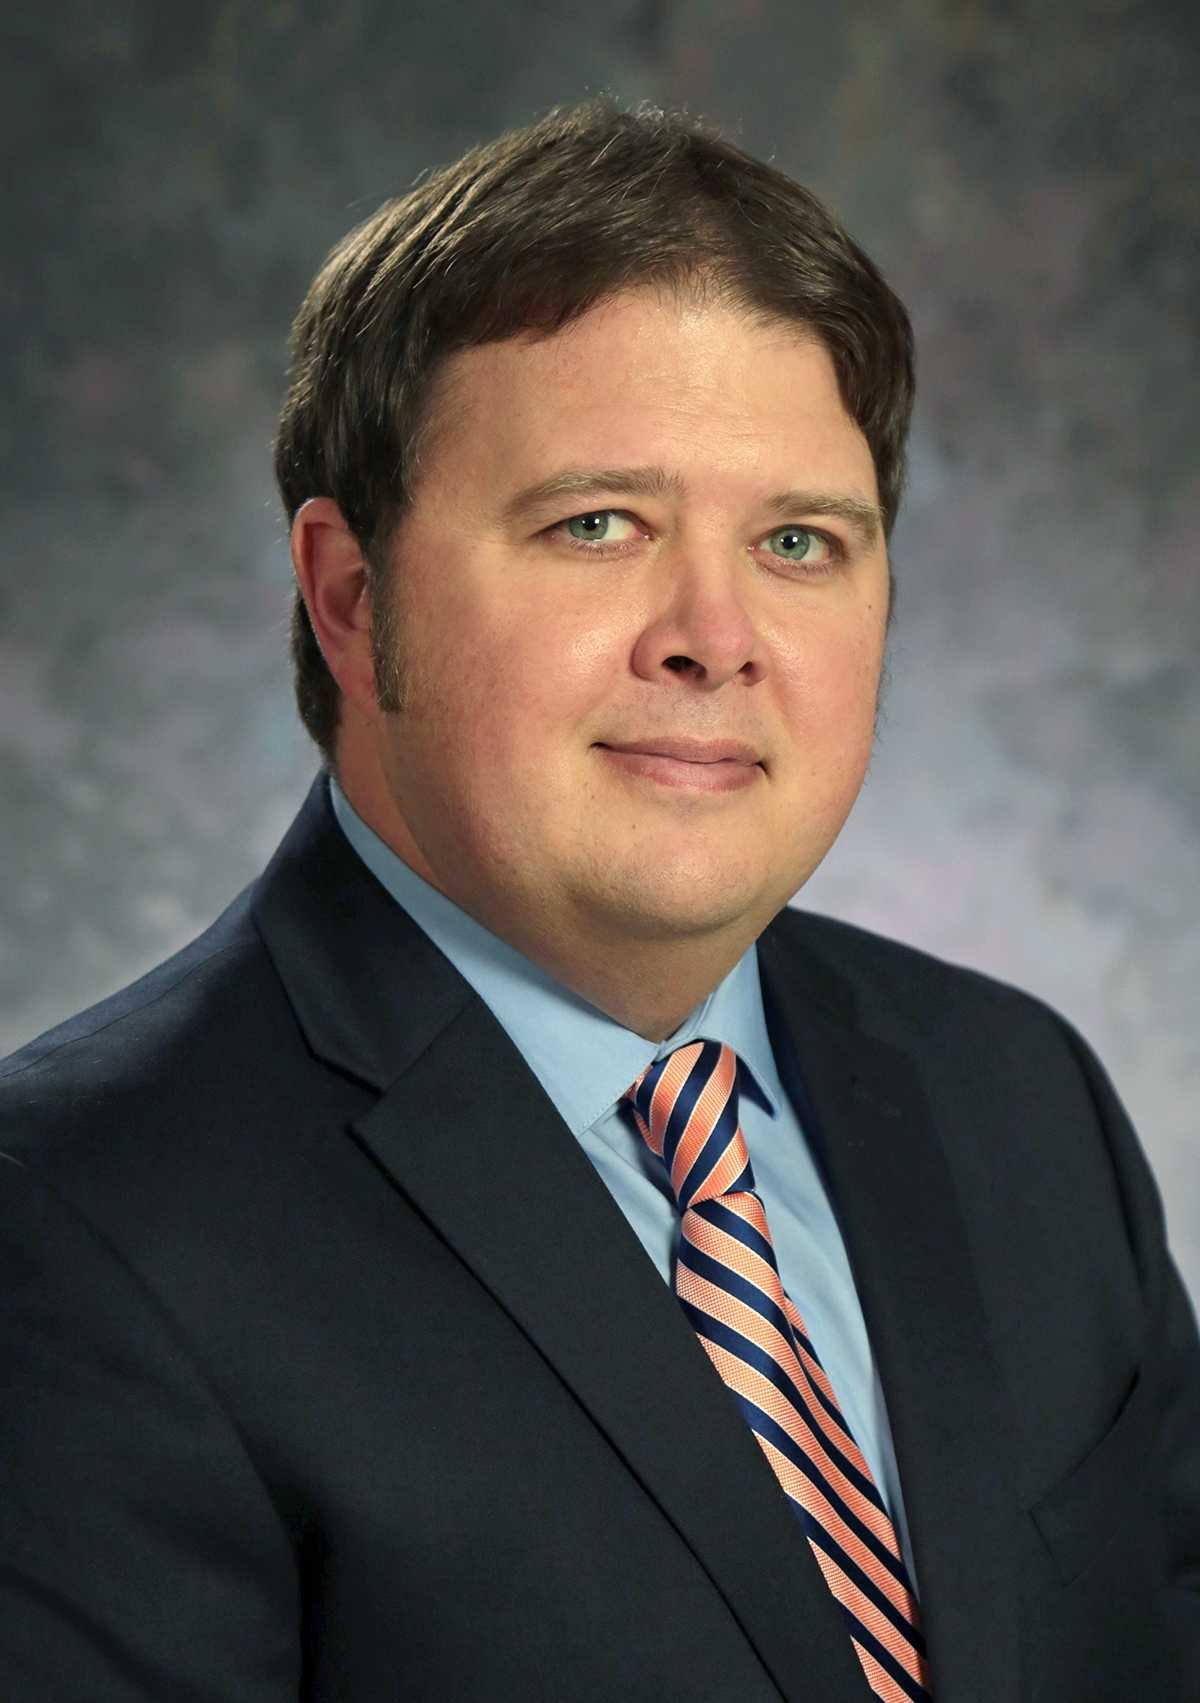 Randy McDonnell